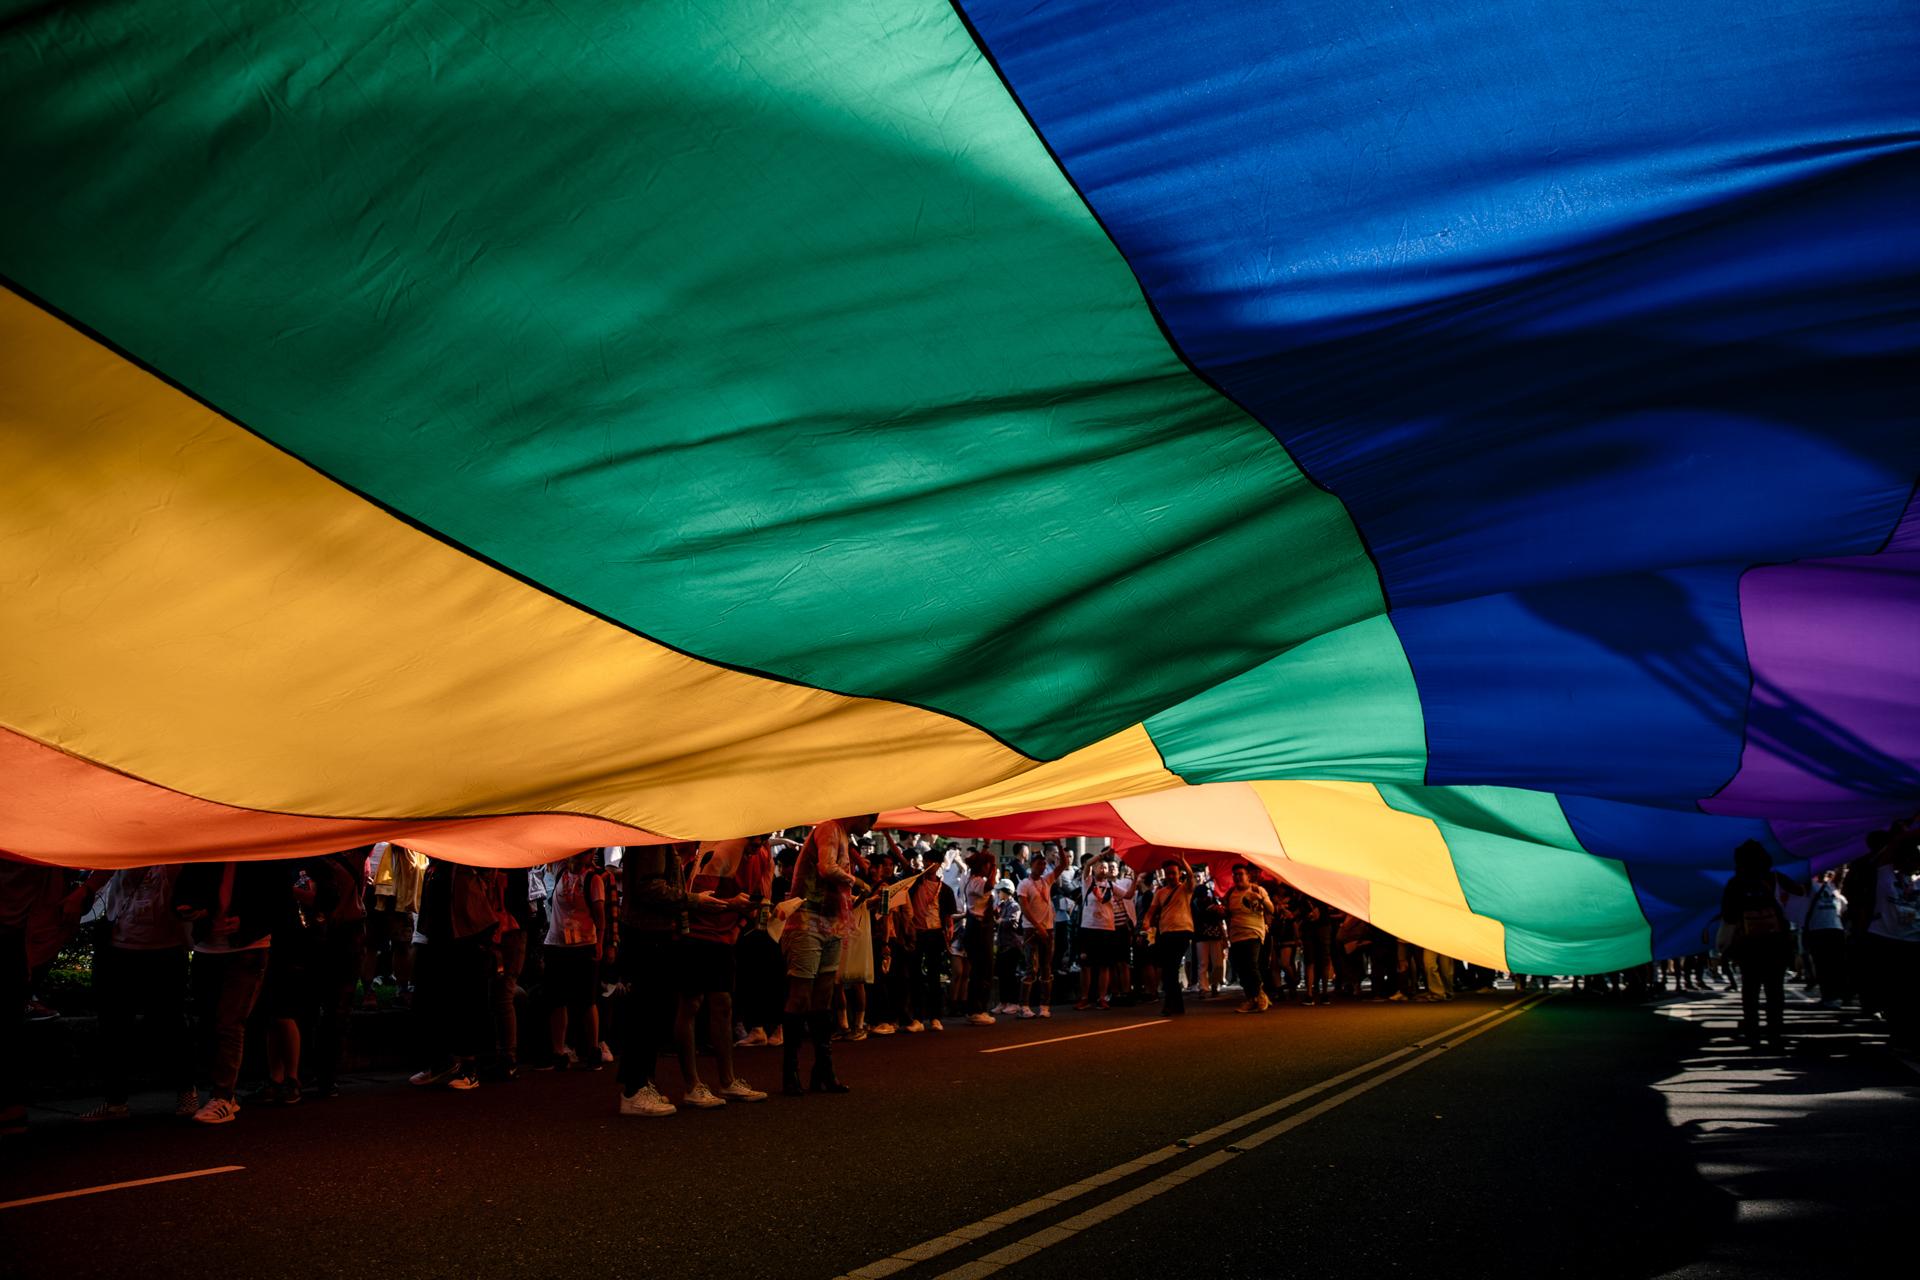 2018 Taiwan LGBT Pride, Taipei, Taiwan (2018)